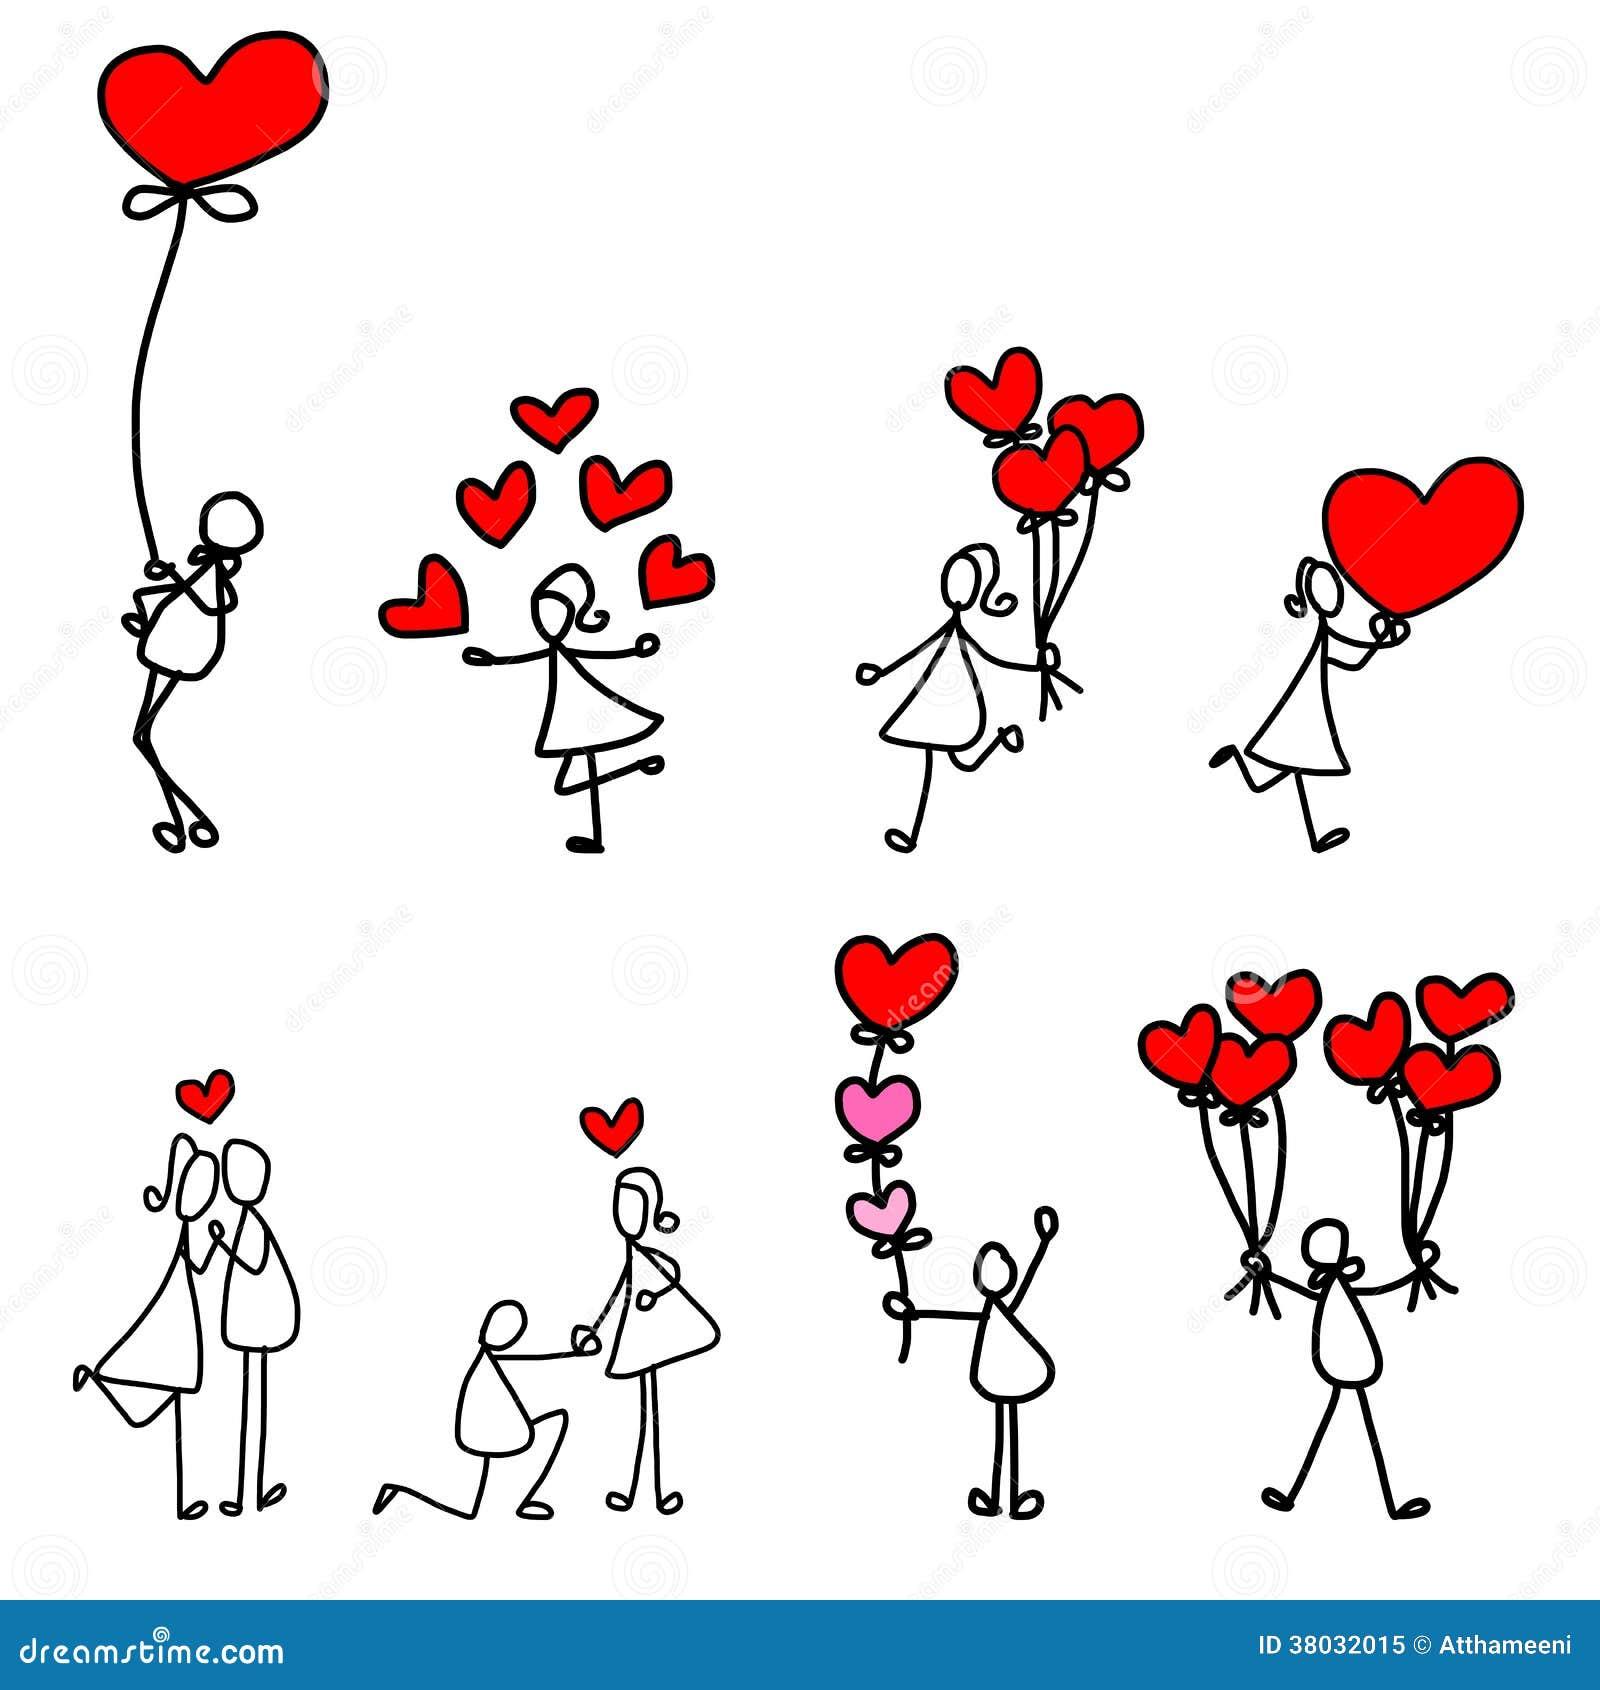 Cartoon hand drawn love